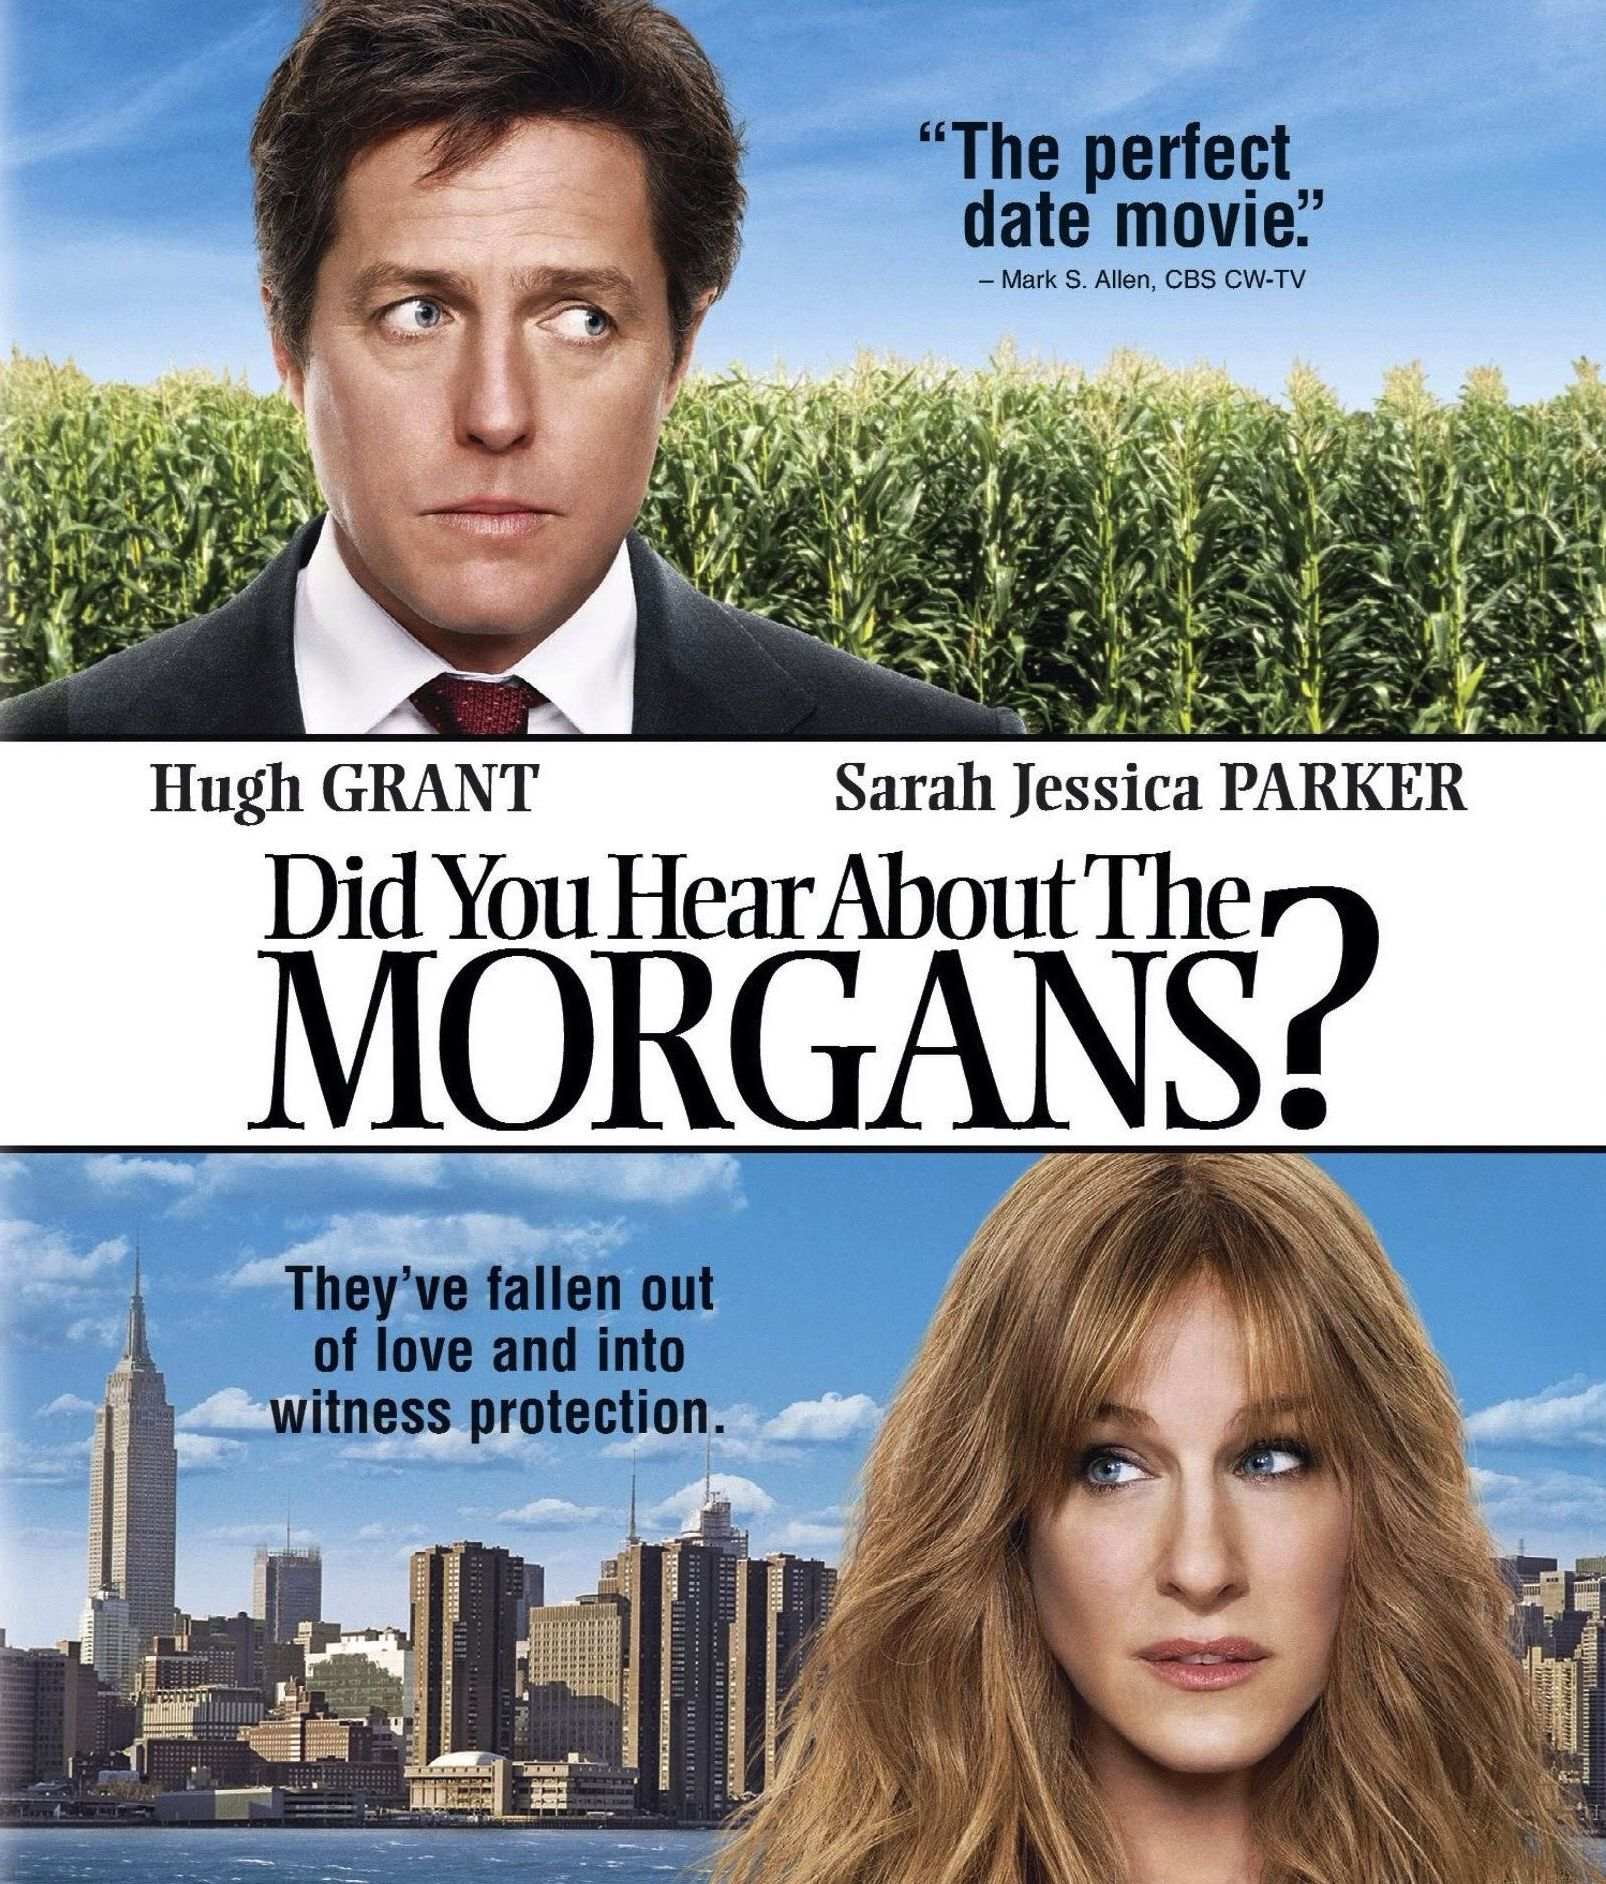 Did You Hear About The Morgans Hugh Grant Morgan Movie Sarah Jessica Parker